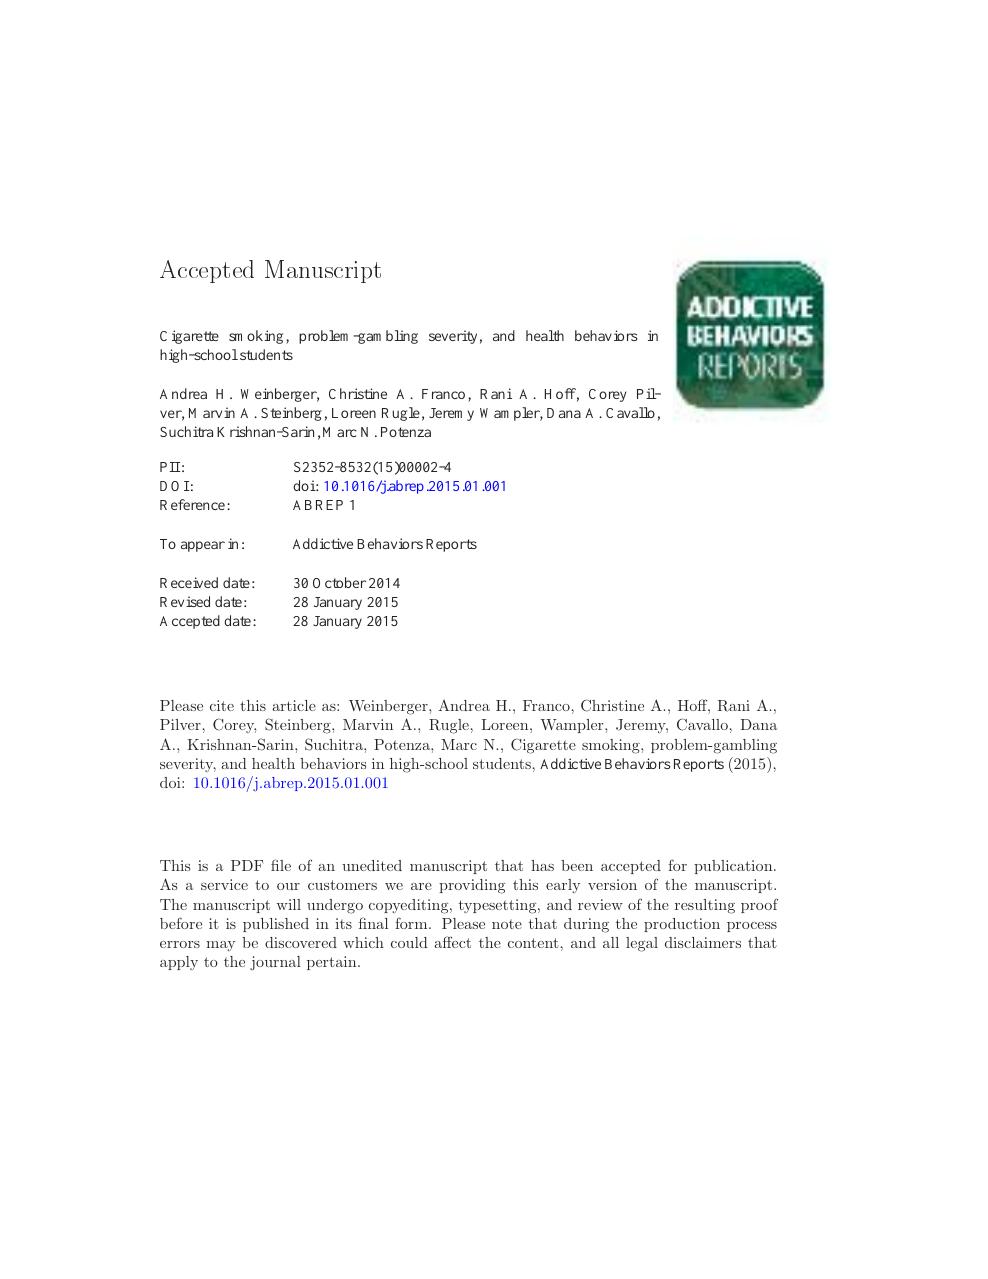 Dissertation improvement grant archaeology